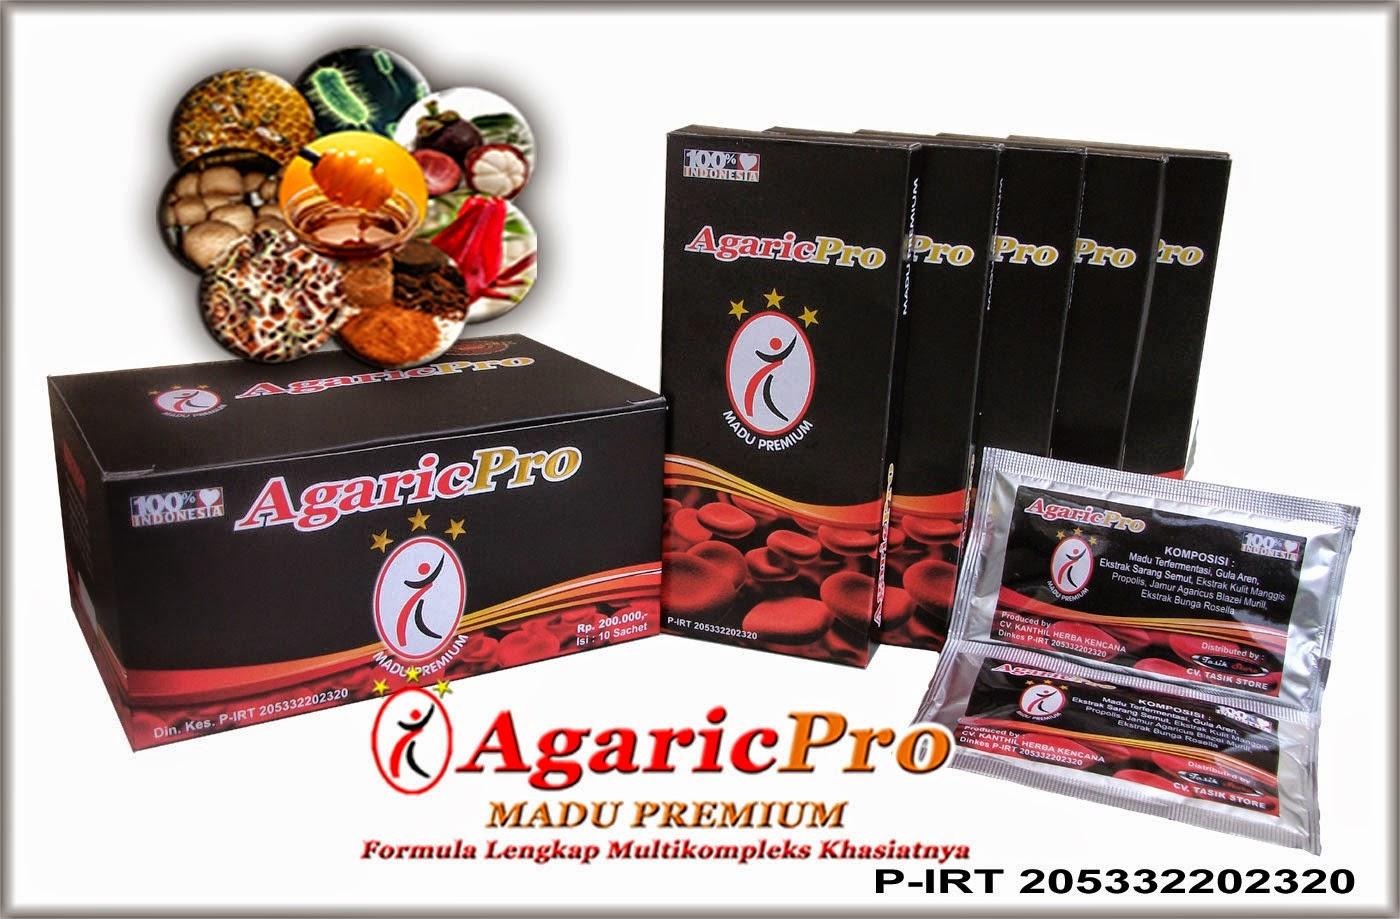 AgaricPro Obat Herbal Penyakit Hematuria